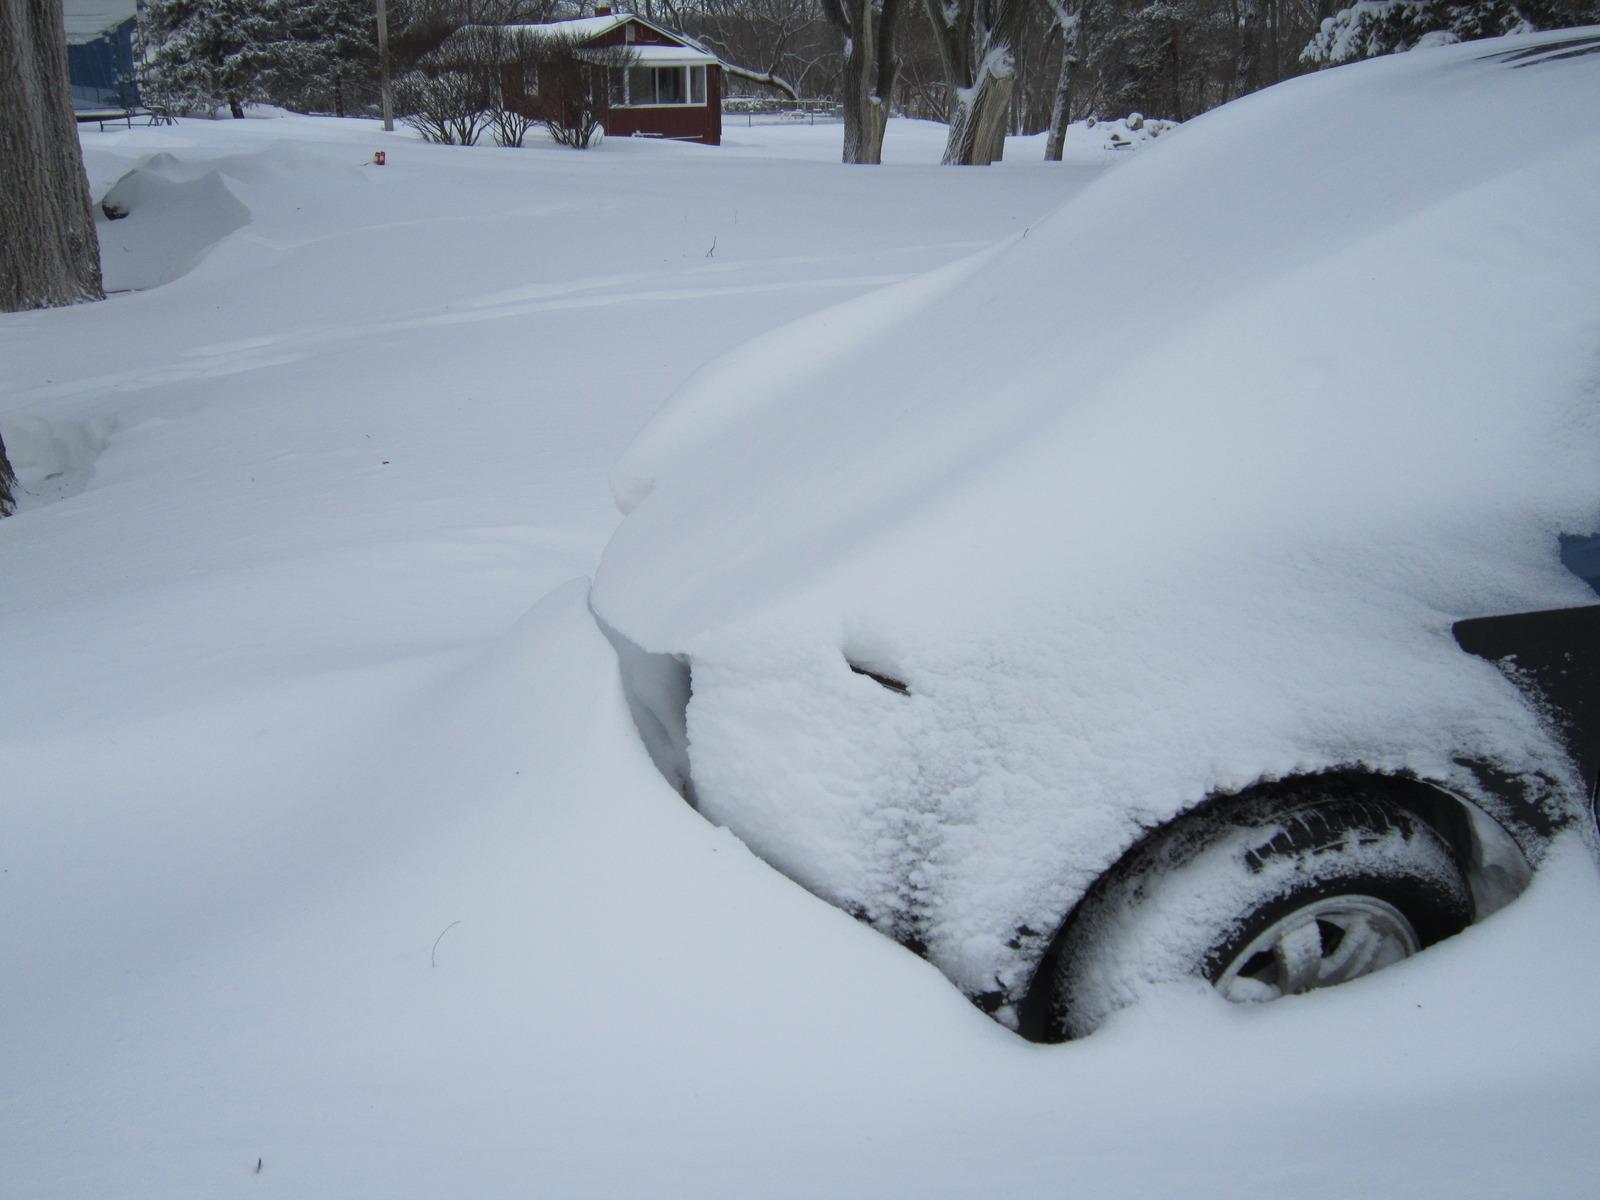 Blizzard feb 2 2011 (1)